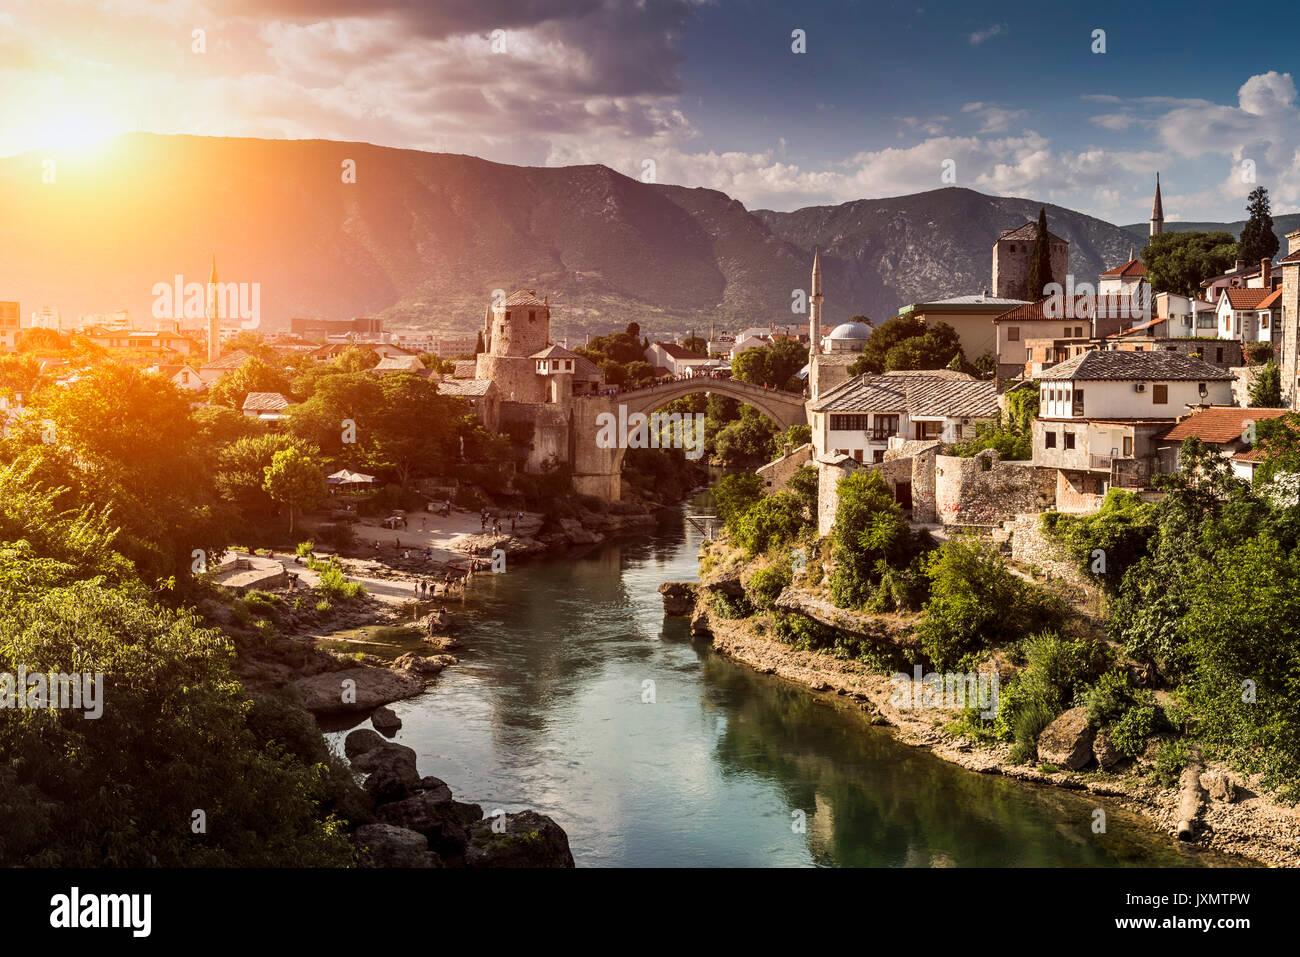 Stari Most, Mostar, Federation of Bosnia and Herzegovina, Bosnia and Herzegovina, Europe - Stock Image